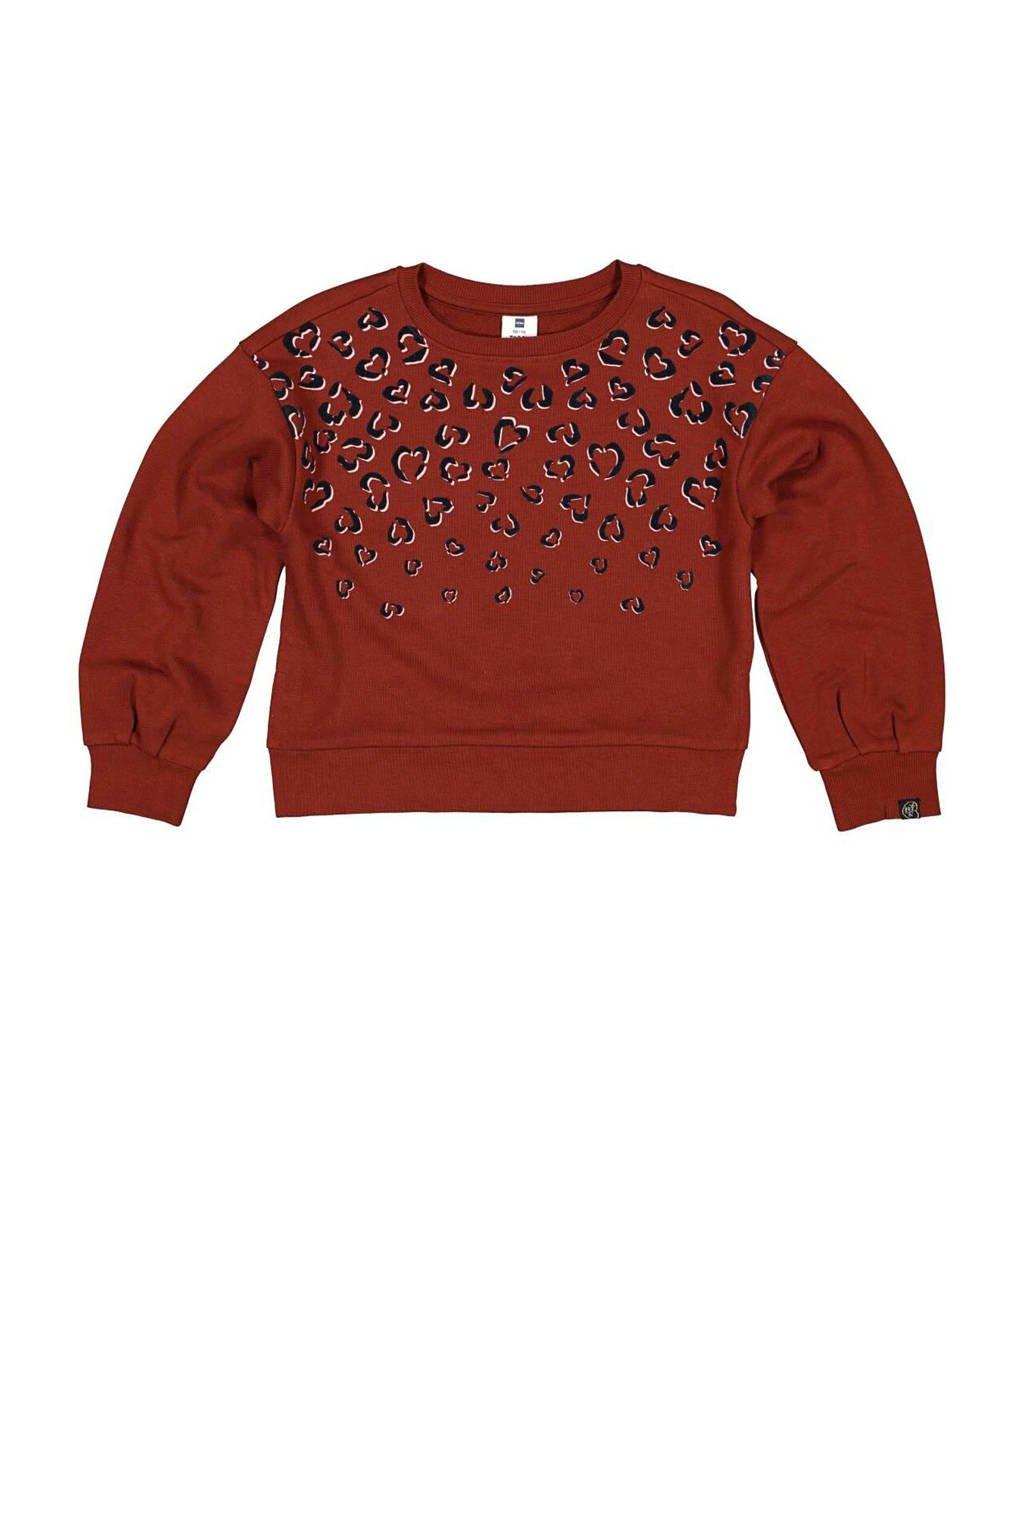 HEMA sweater Scarlett met panterprint bruin, Bruin